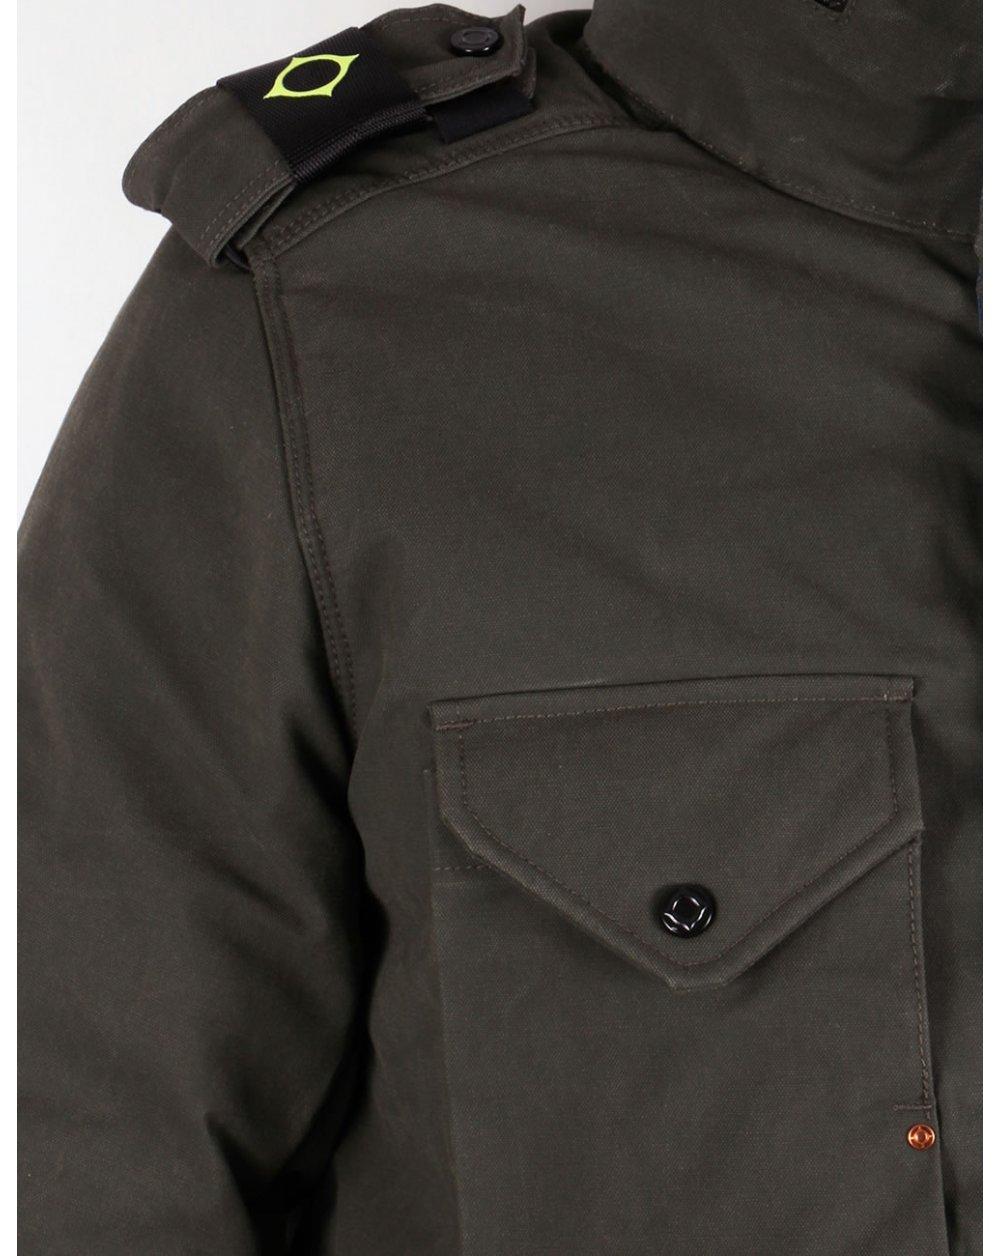 Patagonia Mens Jacket